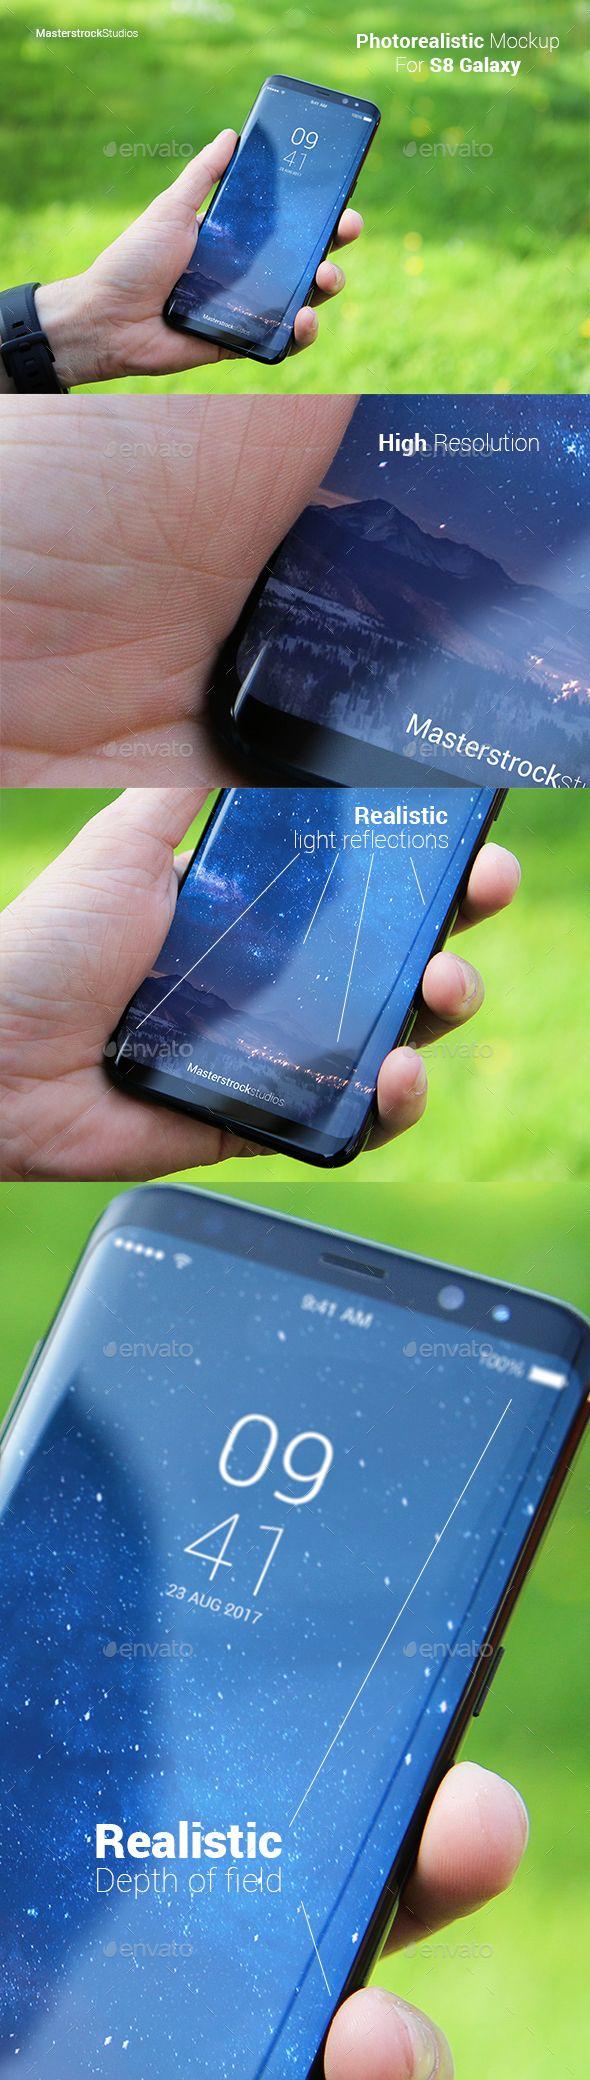 Edit S8 Galaxy Smartphone Photo-realistic Mockup 4